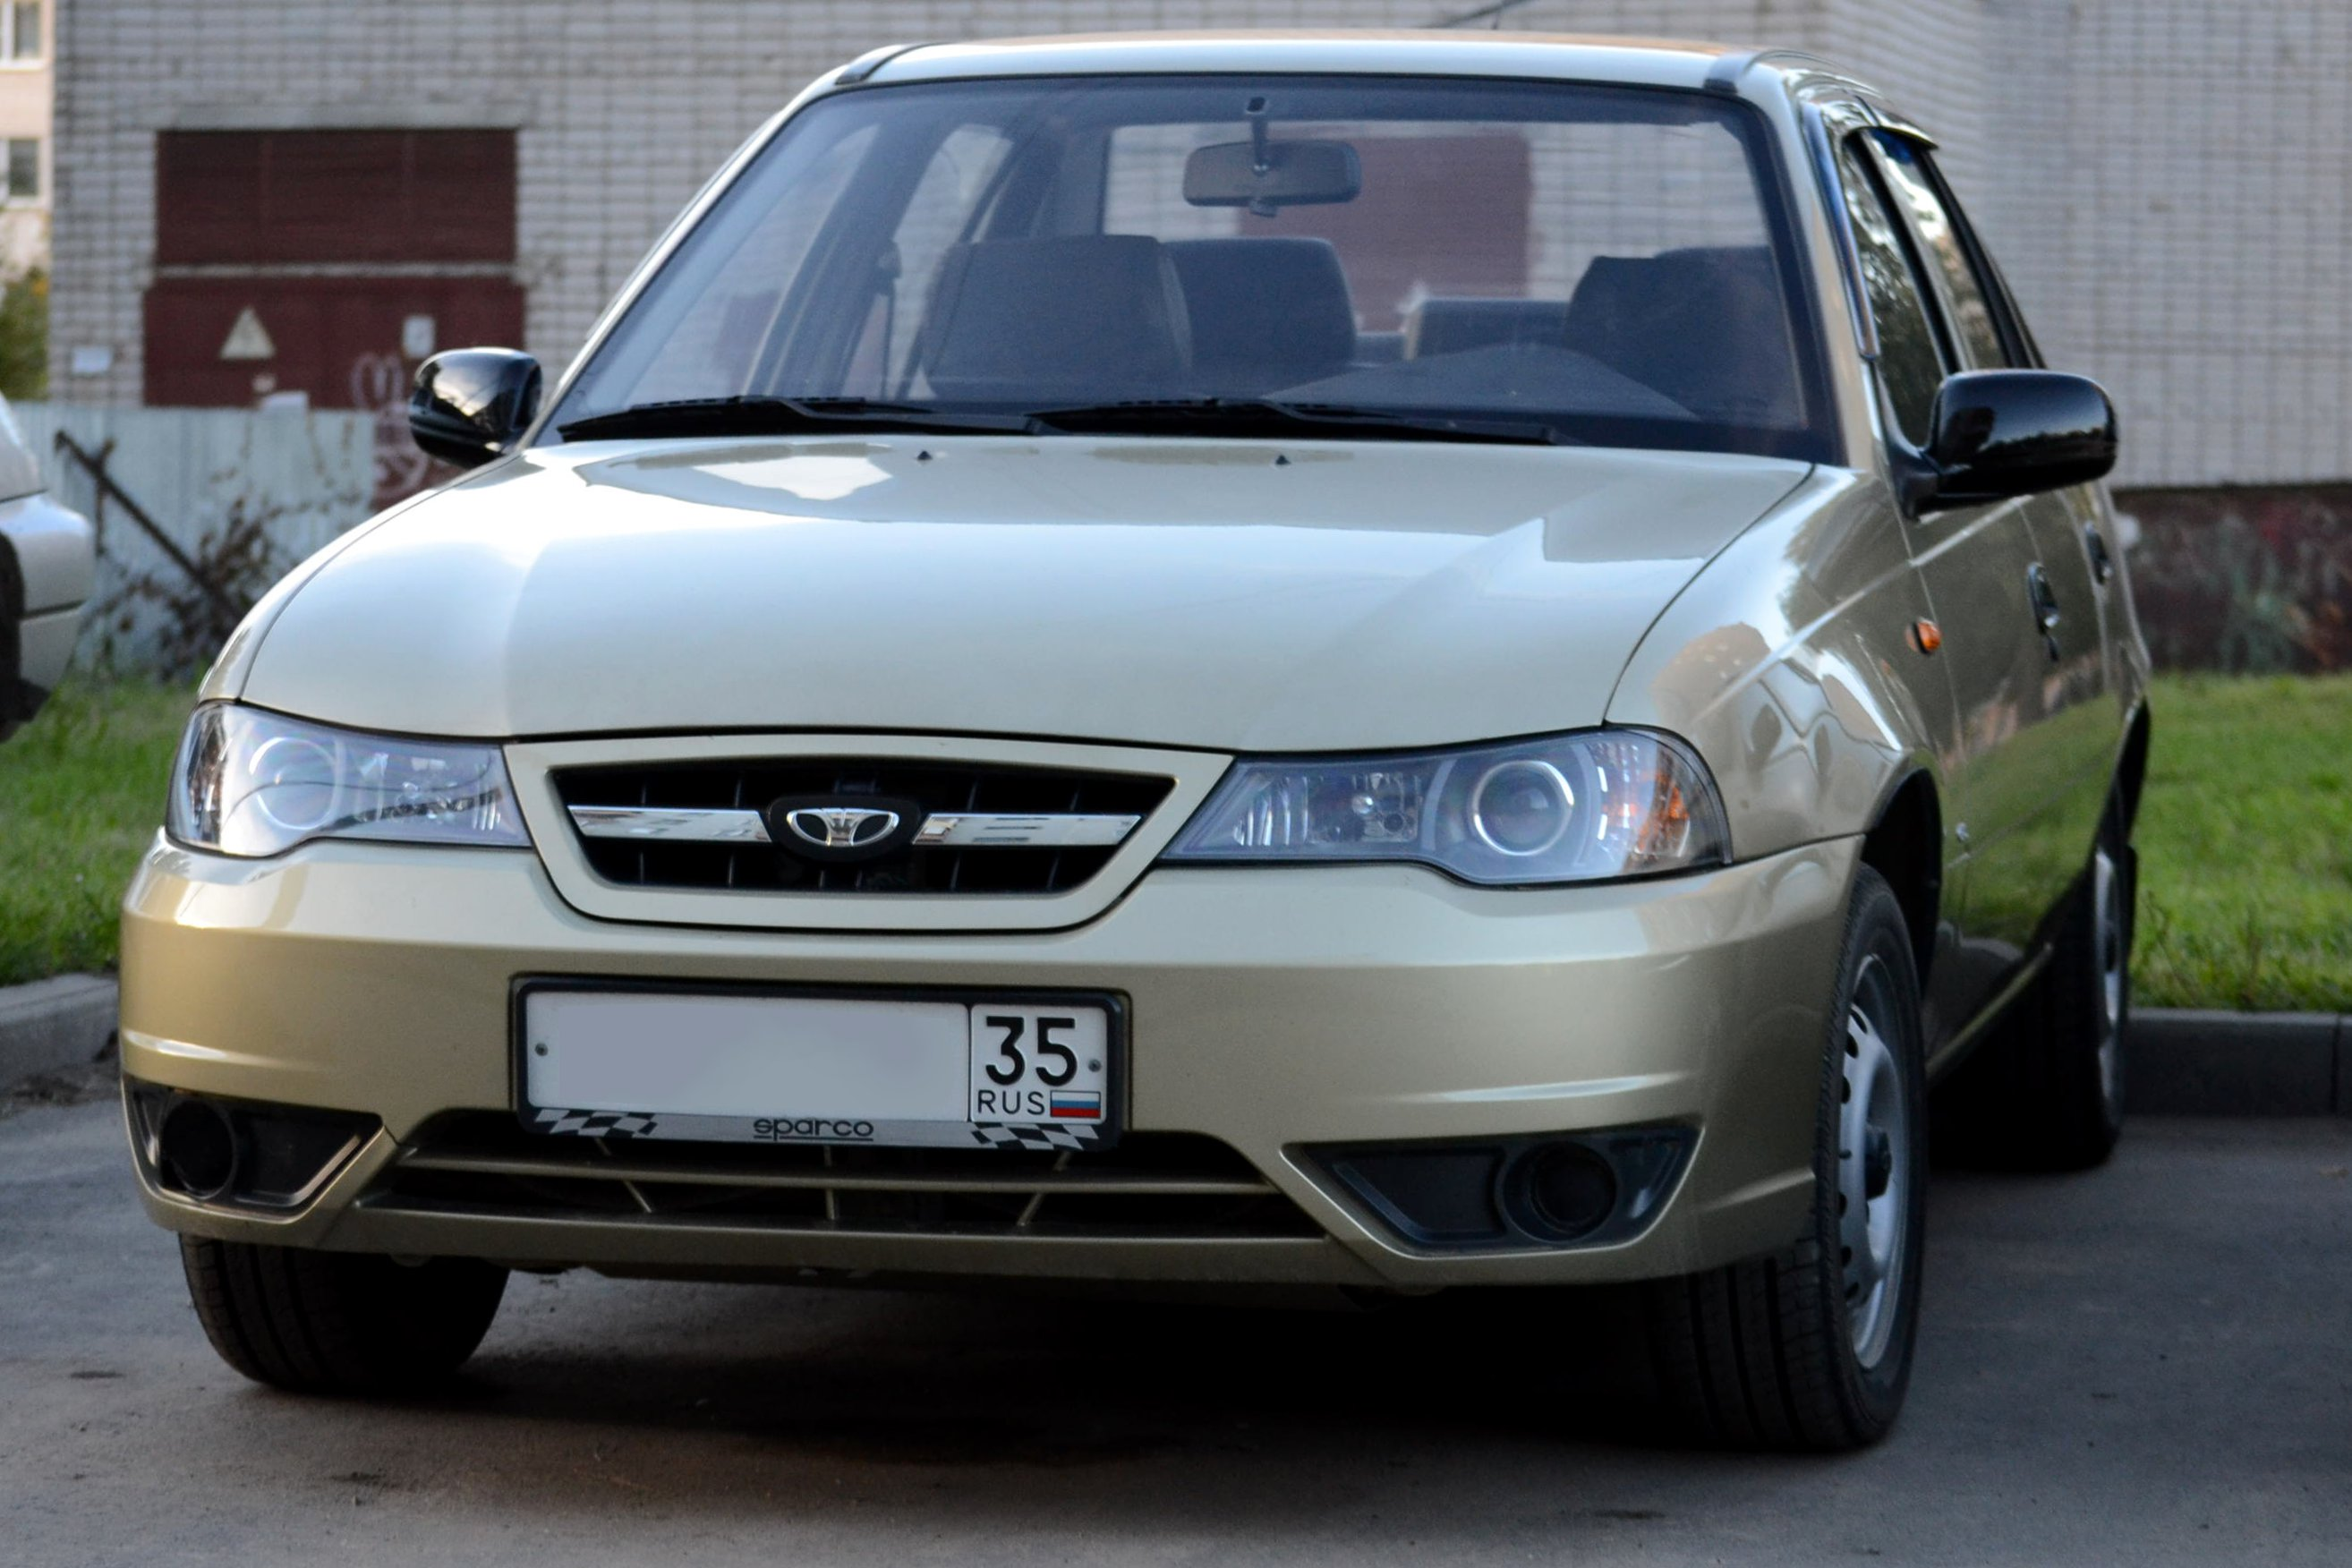 Daewoo Nexia I Restyling 2008 - 2016 Sedan #5